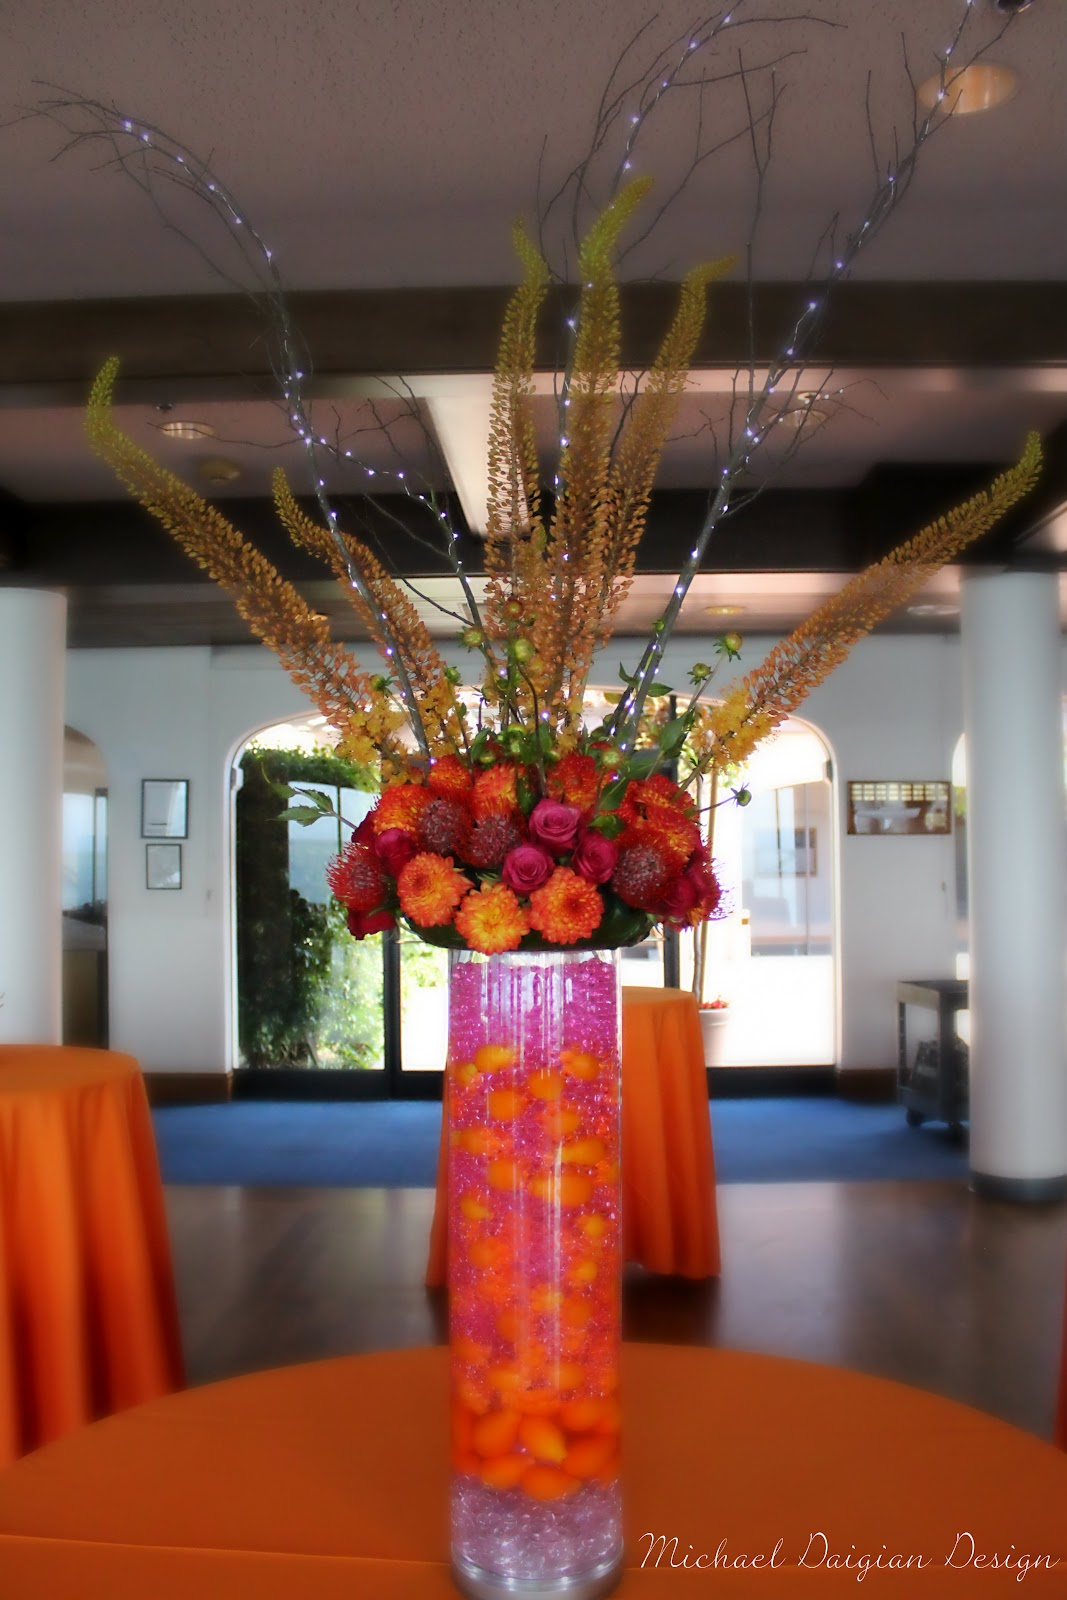 Michael Daigian Design: 50th Birthday Party